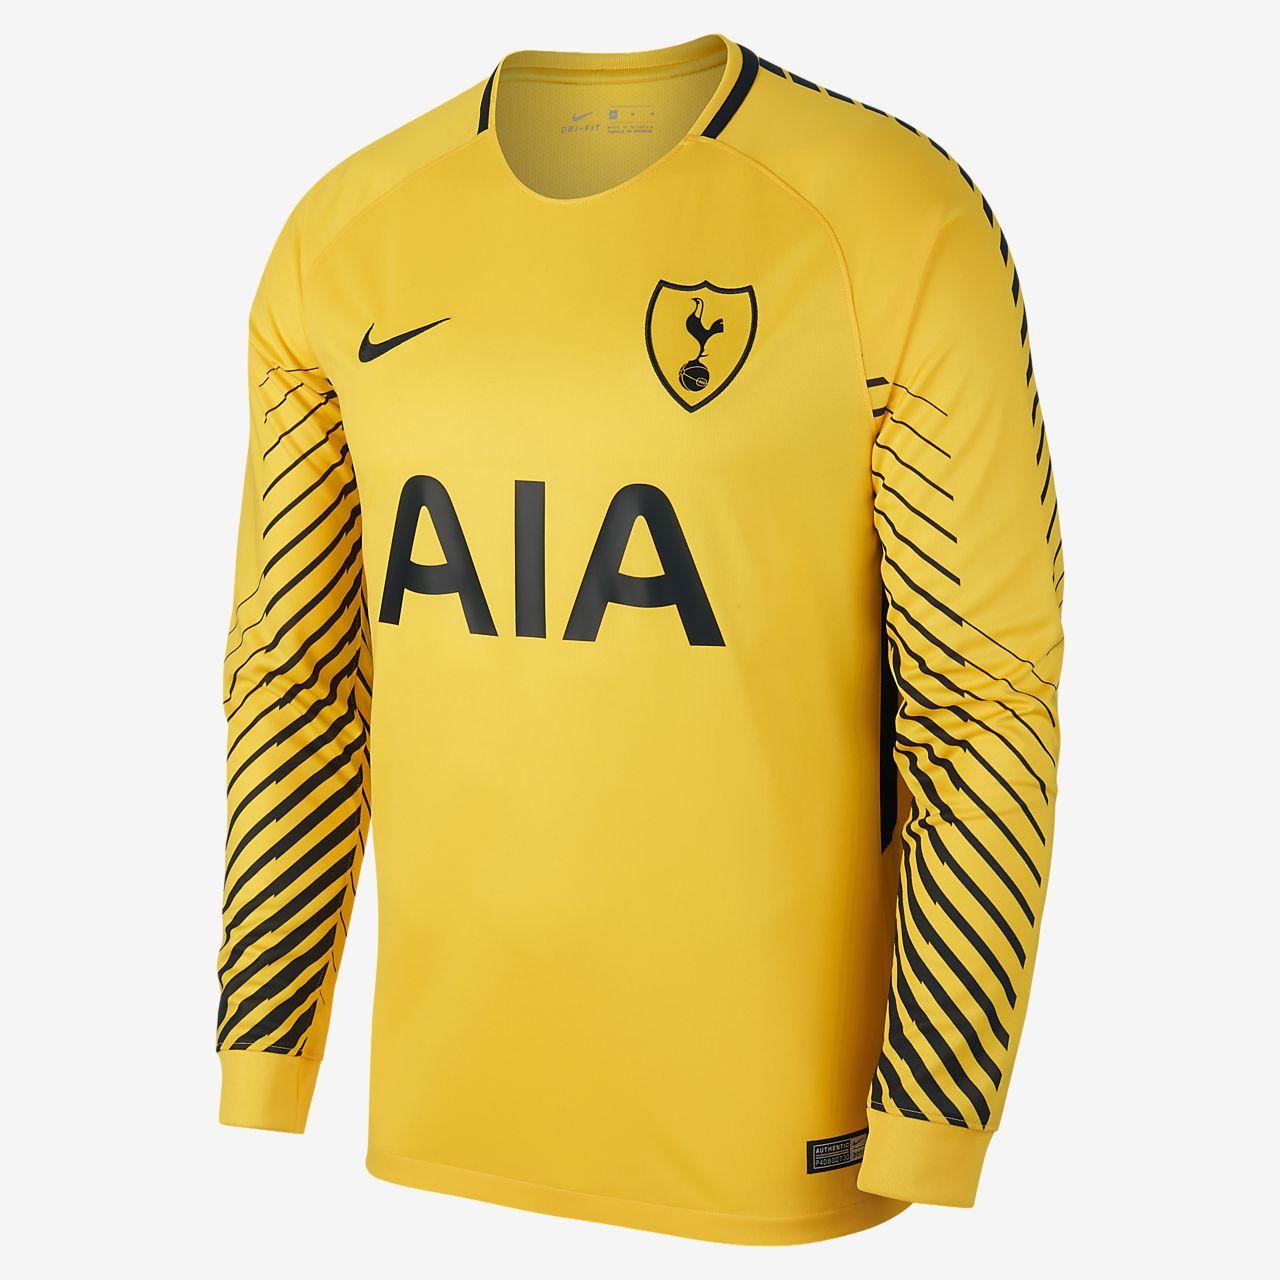 ce3a7db12a850 ... Camiseta de fútbol de manga larga para hombre de arquero Stadium del  Tottenham Hotspur 2017